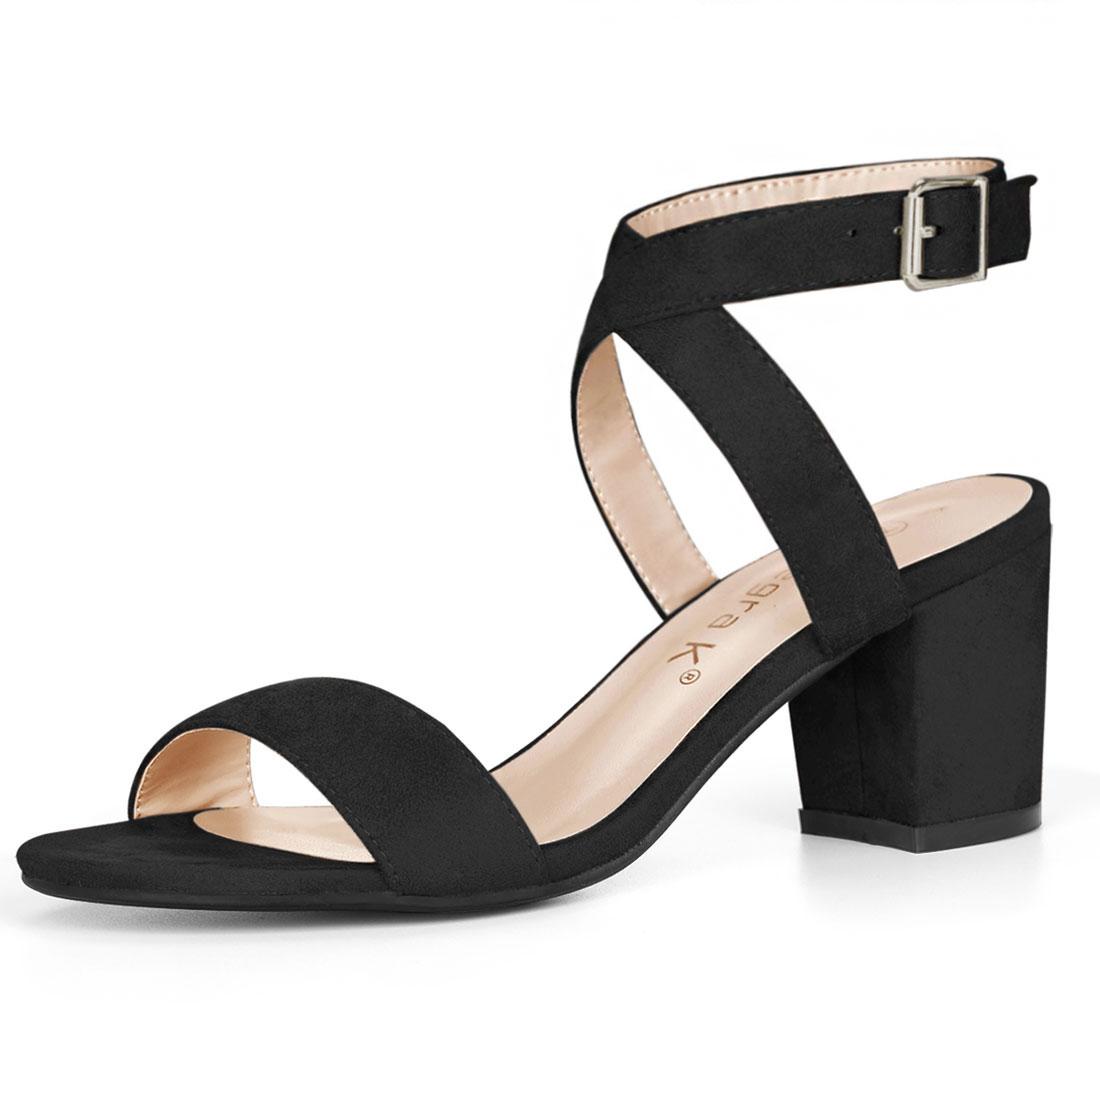 Allegra K Women's Crisscross Mid Block Heel Ankle Strap Sandals Black US 7